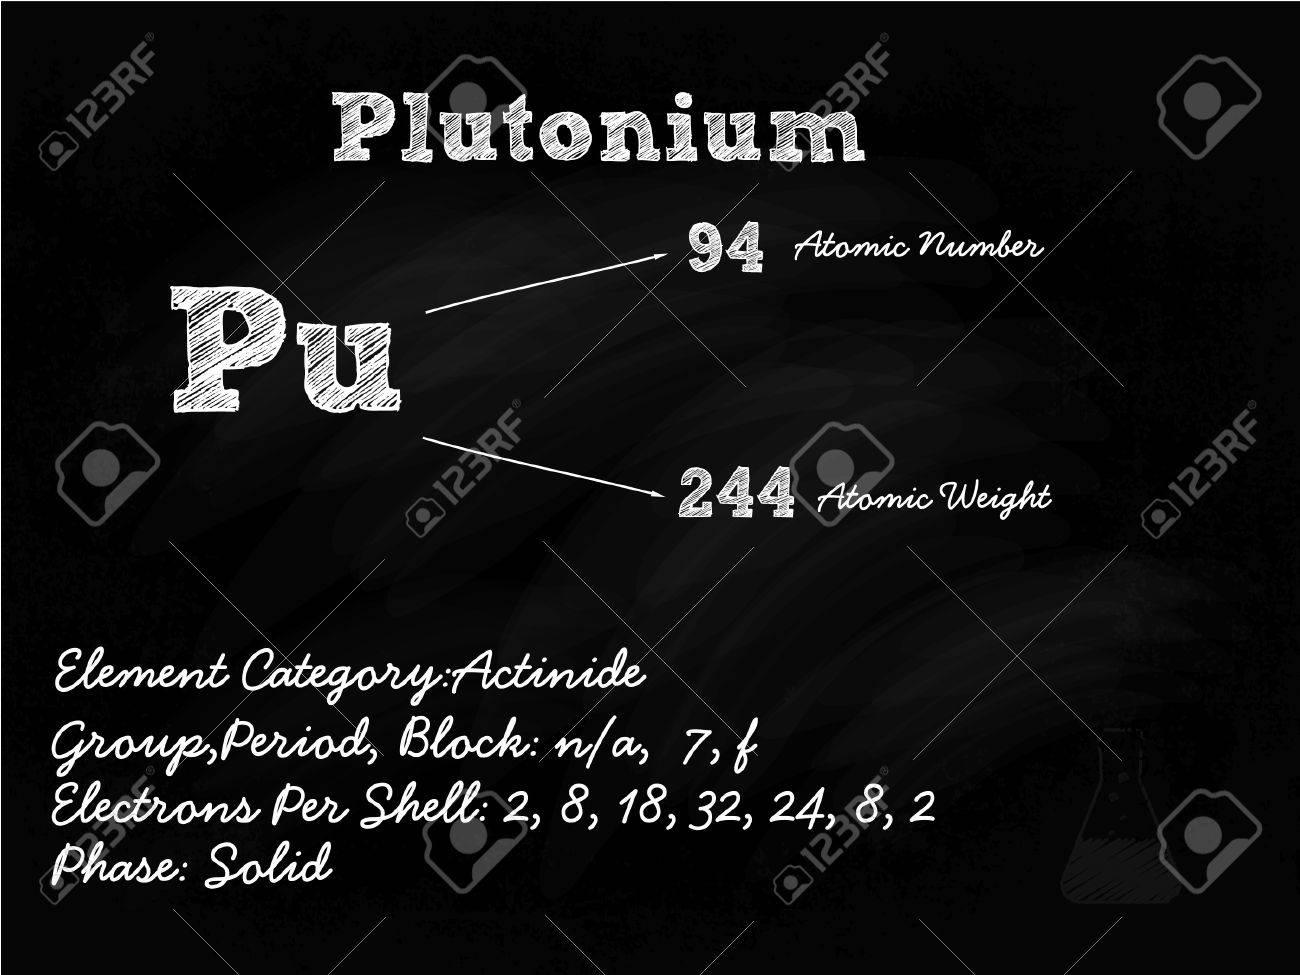 Plutonium Symbol Illustration On Blackboard With Chalk Stock Vector - 22205222